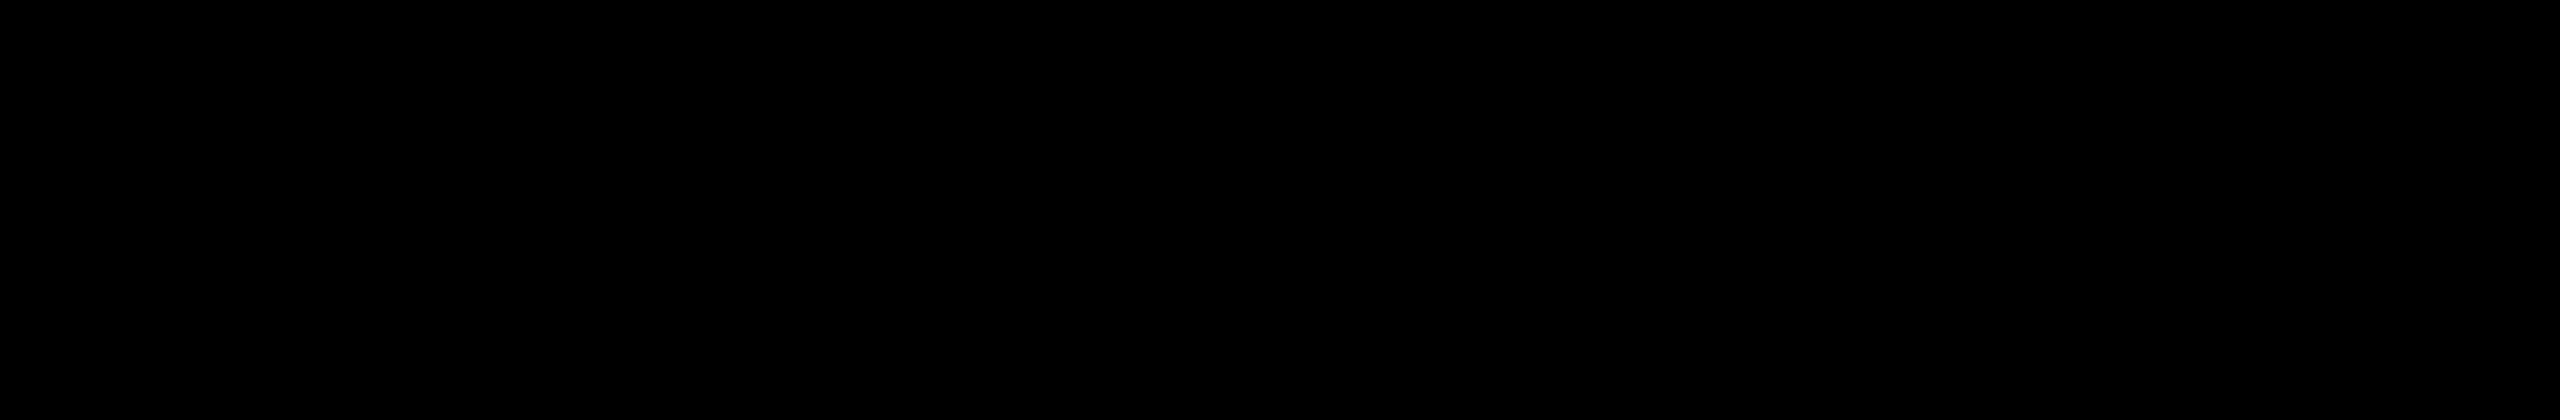 Major Scale Formula